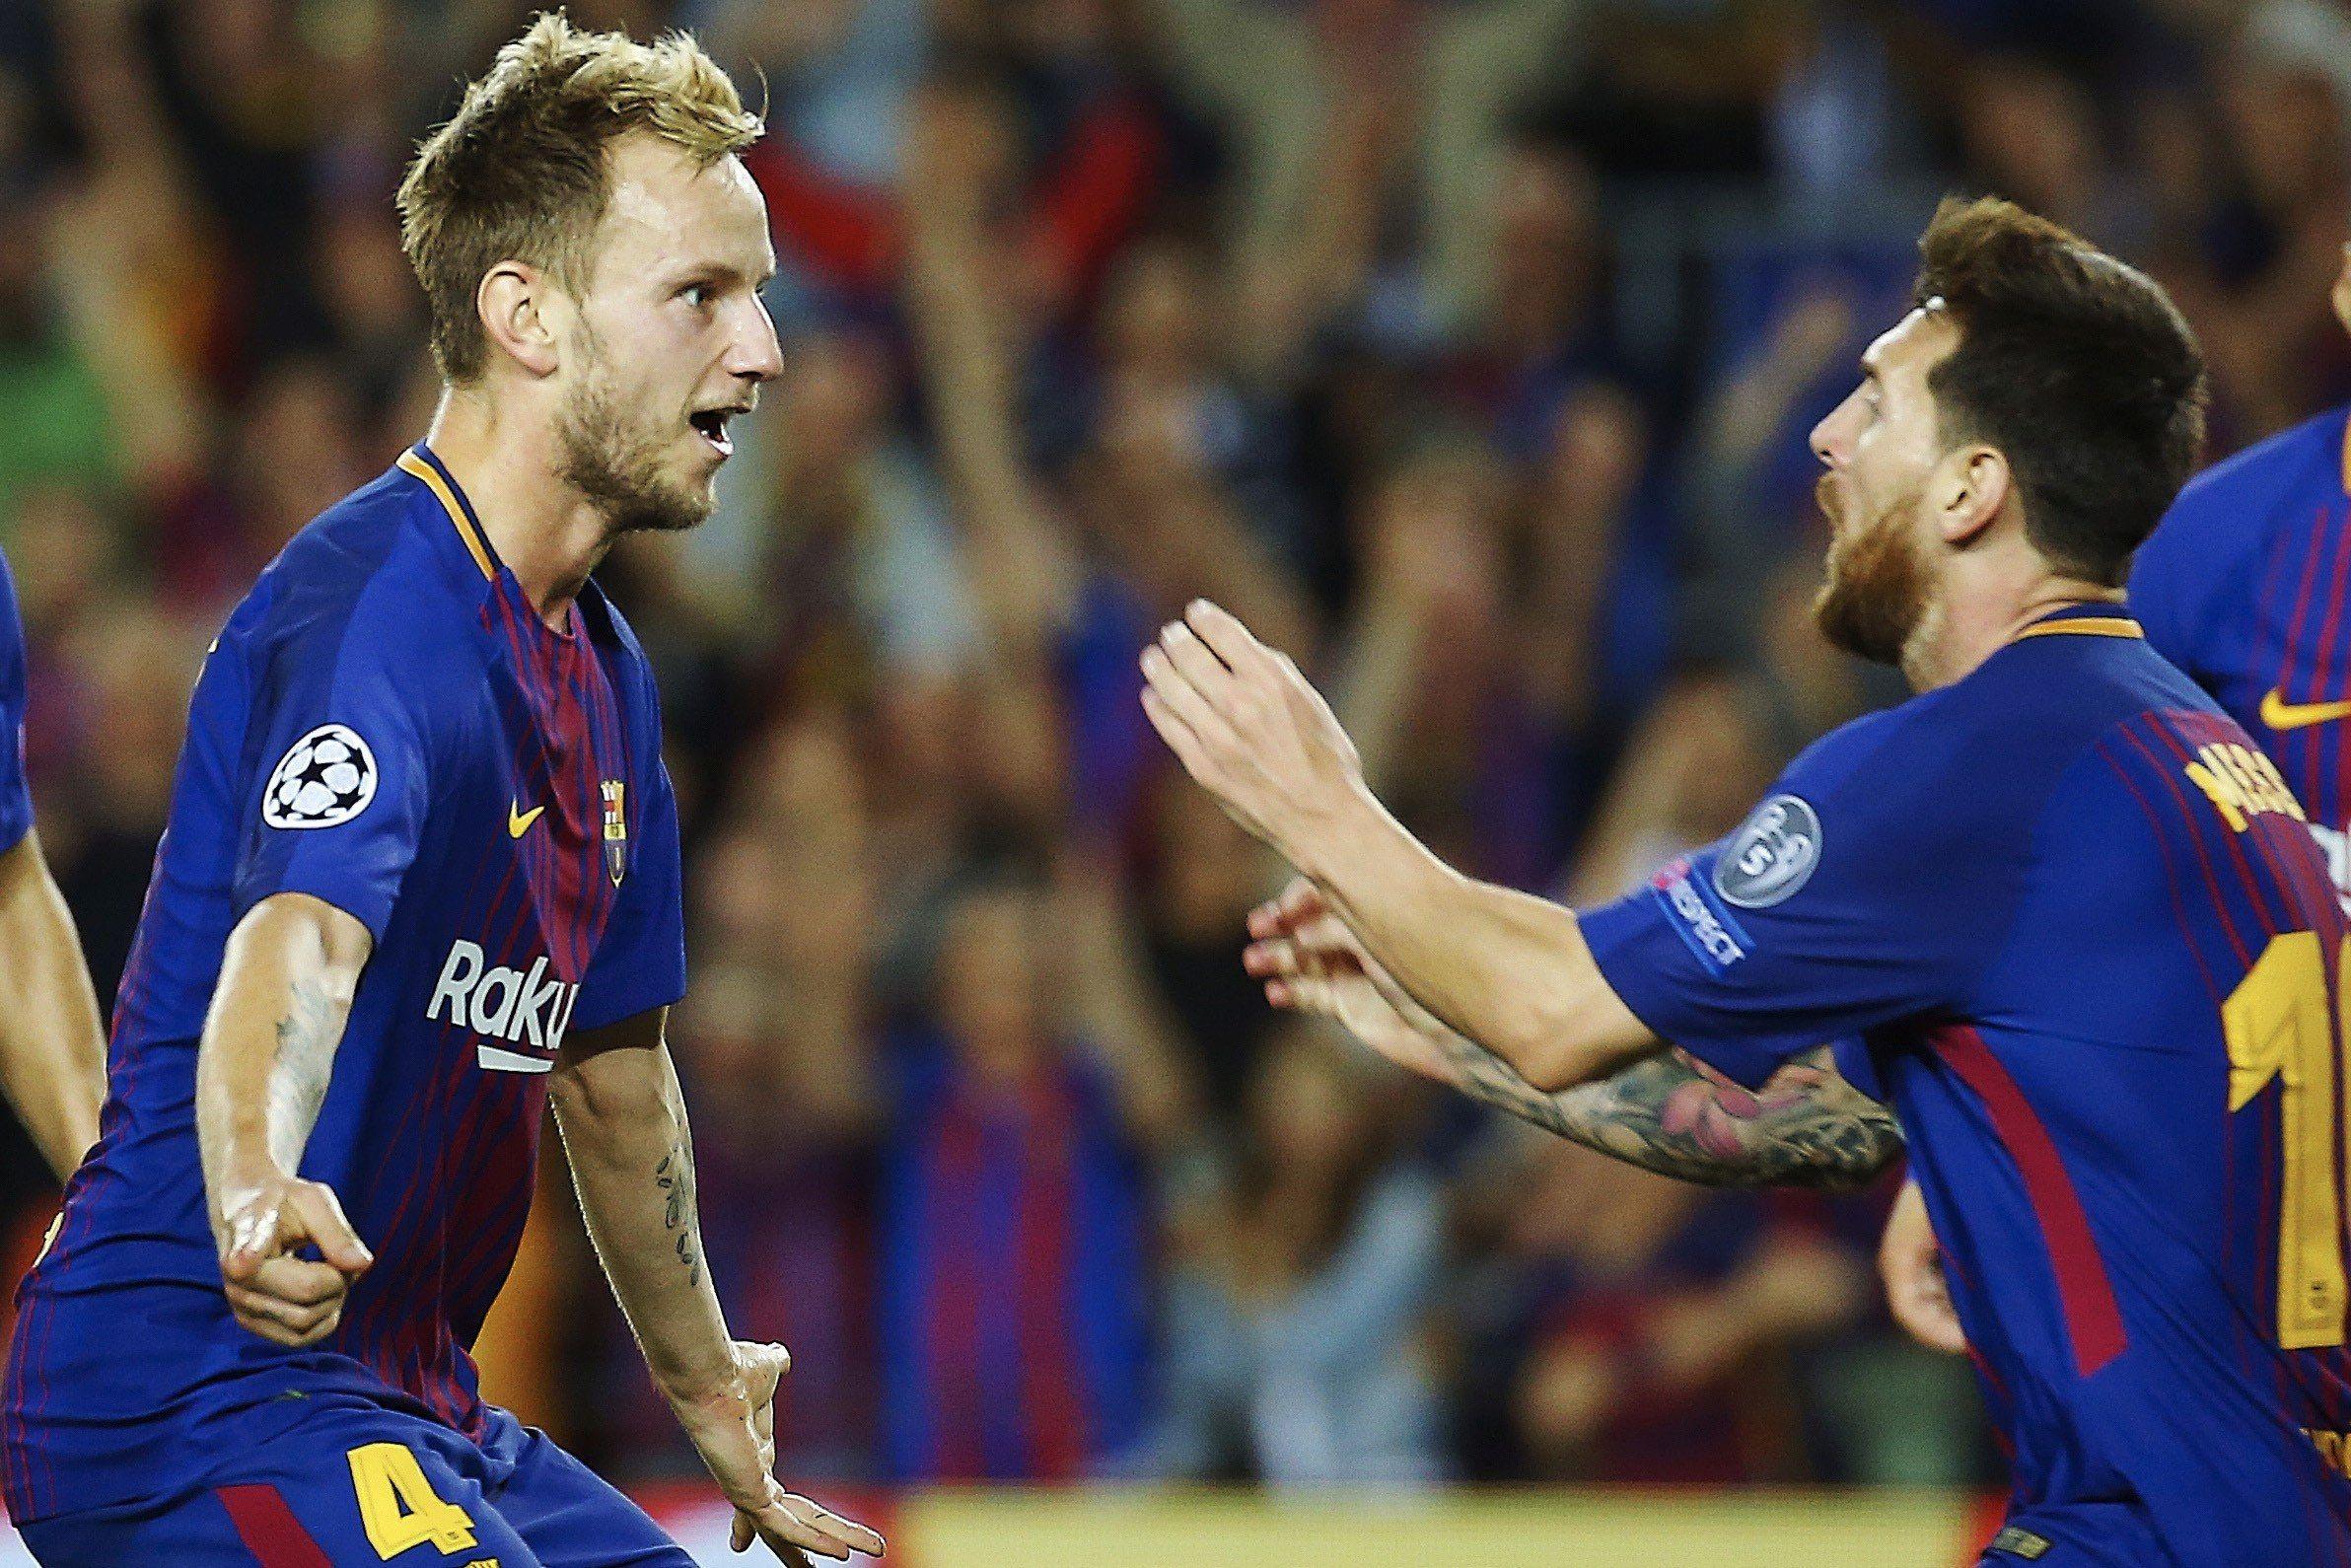 LP – Barcelona razbila Juventus, goljade Chelsea i PSG-a, pogodak Rakitića